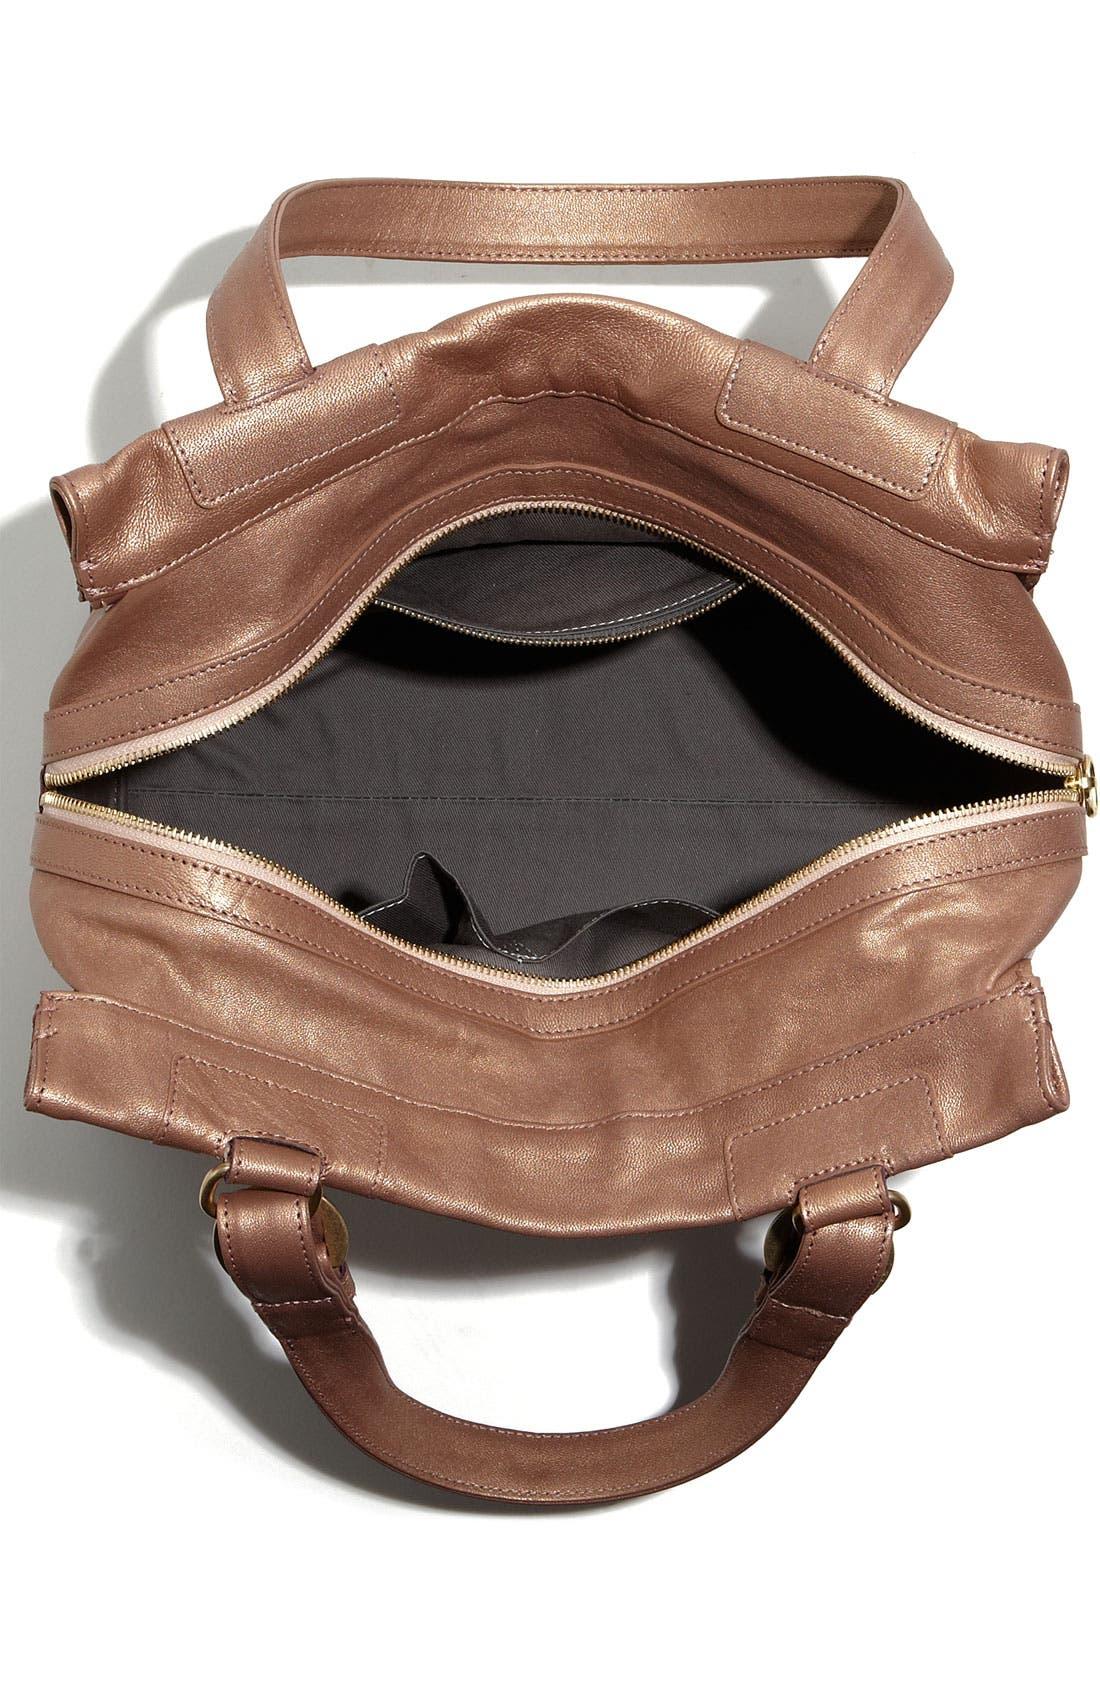 Alternate Image 3  - See By Chloé 'Poya Metallic Vintage' Leather Shoulder Bag